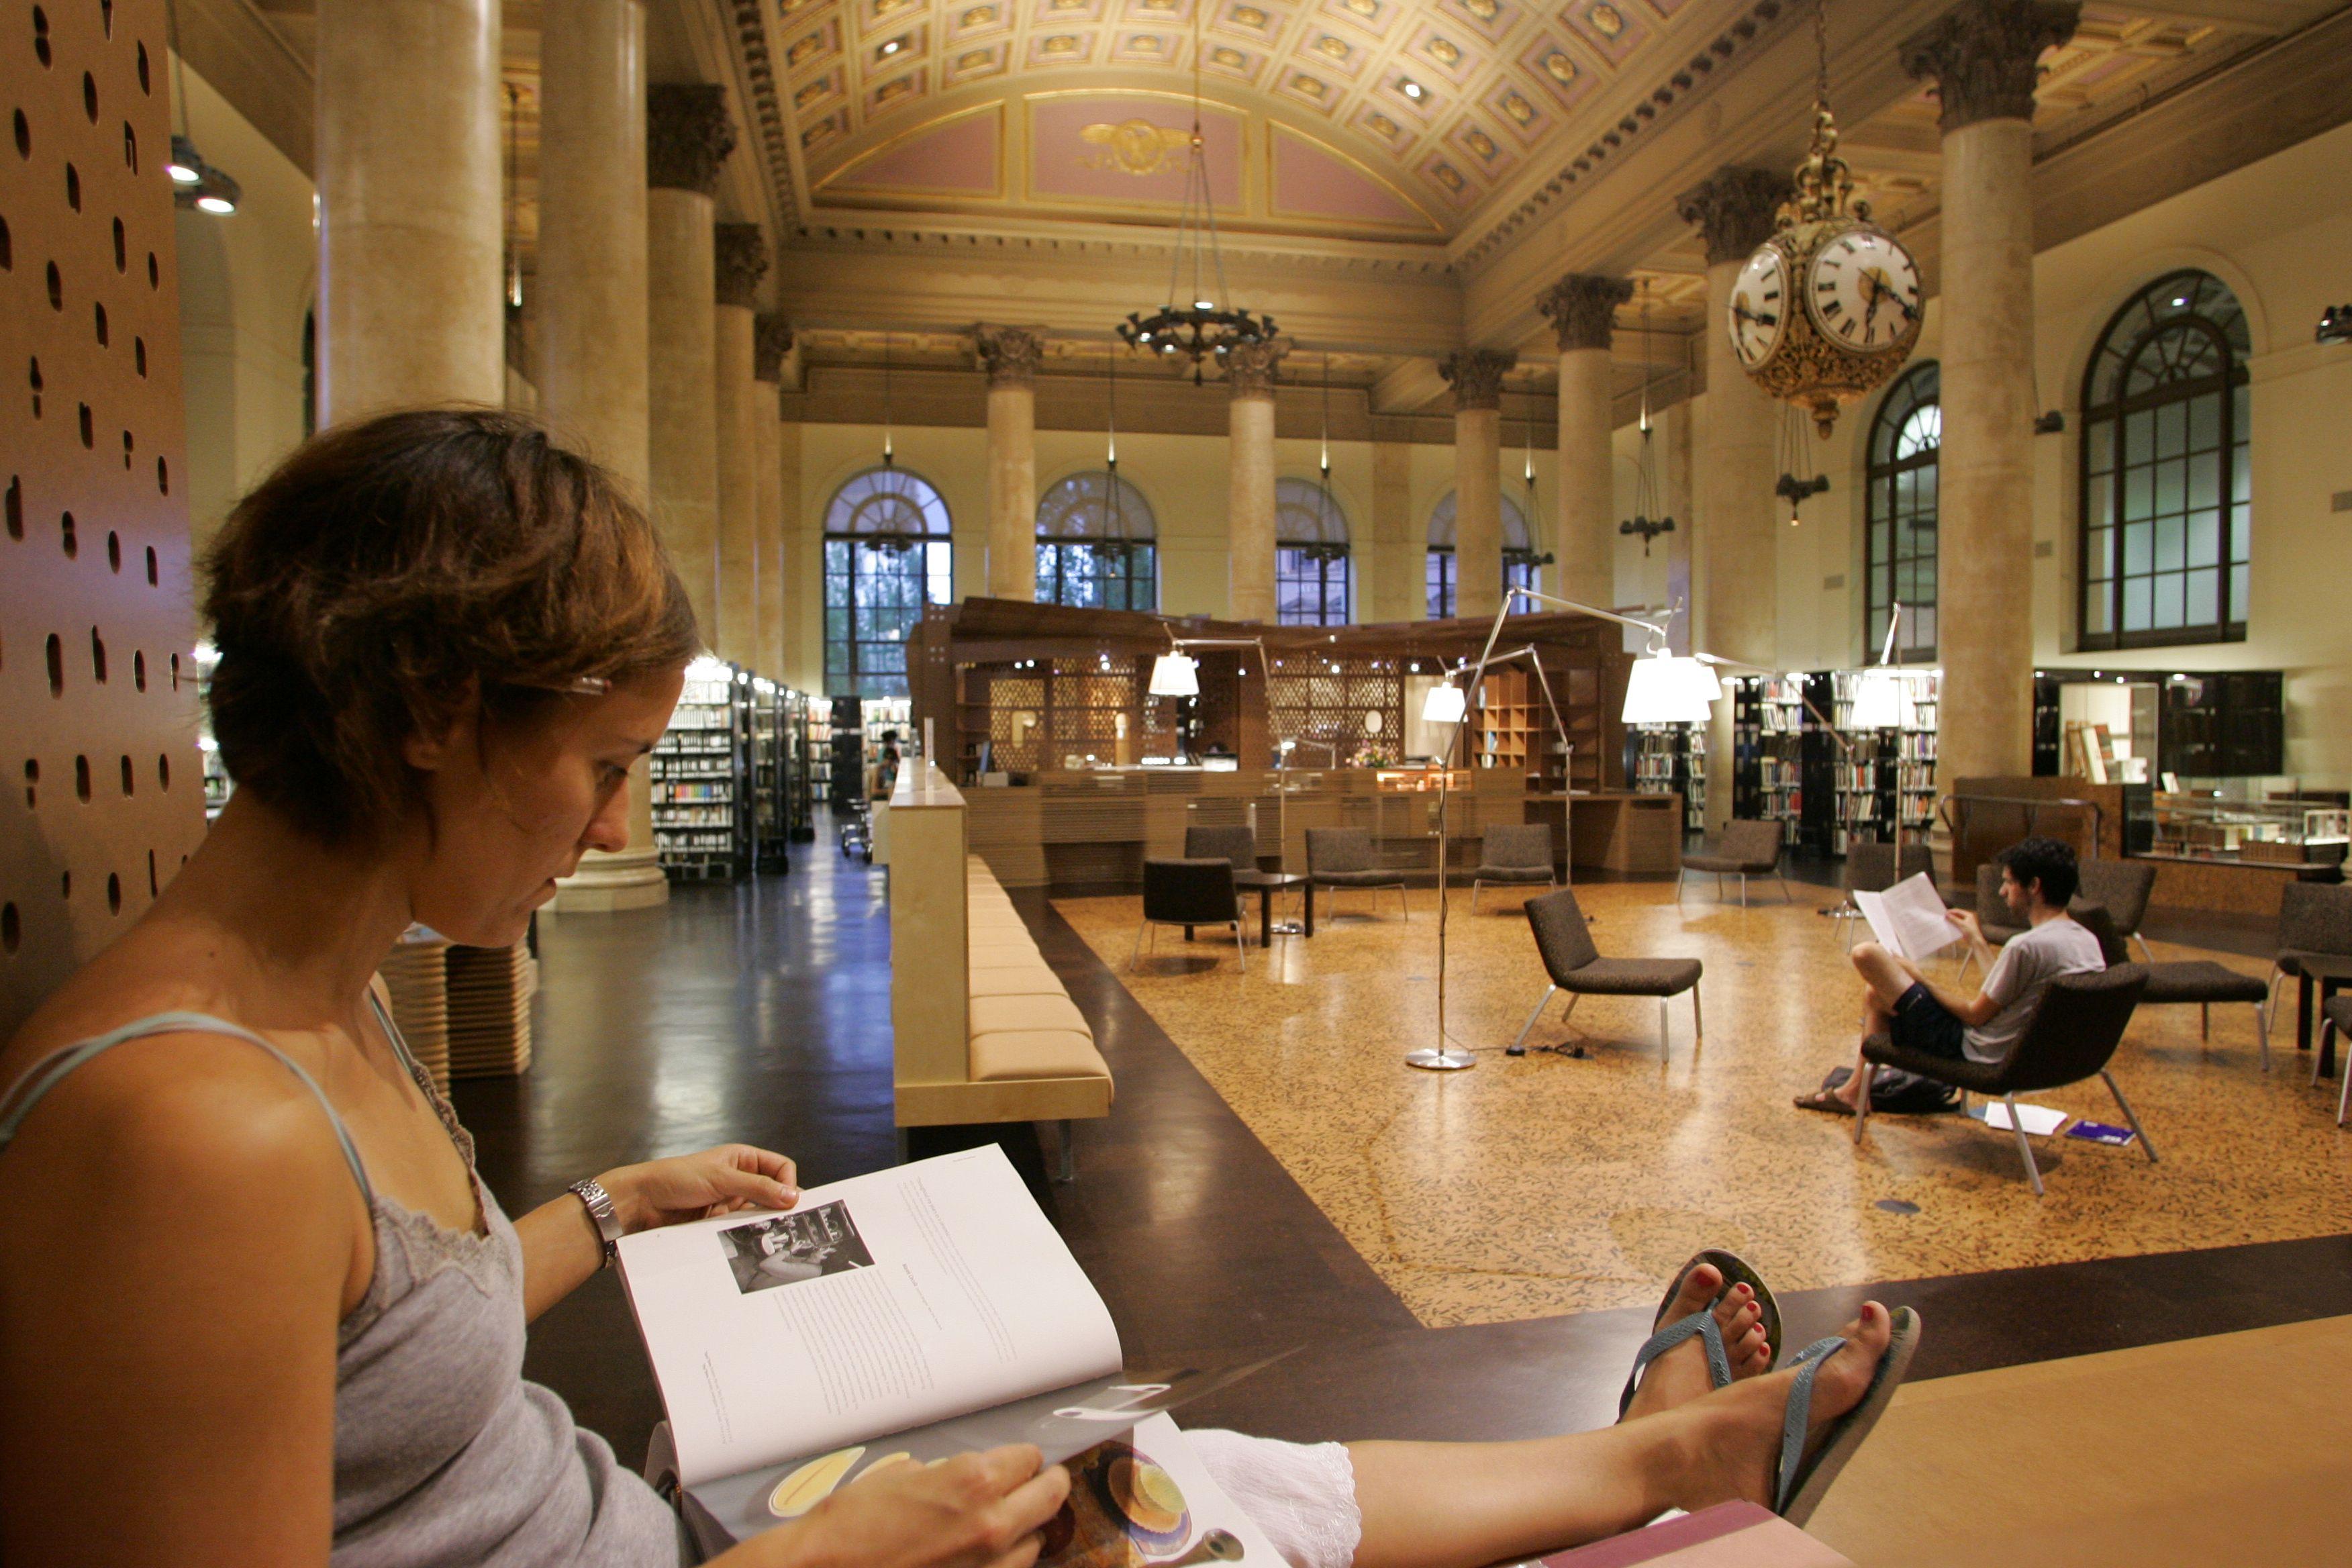 RISD Fleet Library Interior Providence RI Island HospitalInstitute Of DesignIntelligent